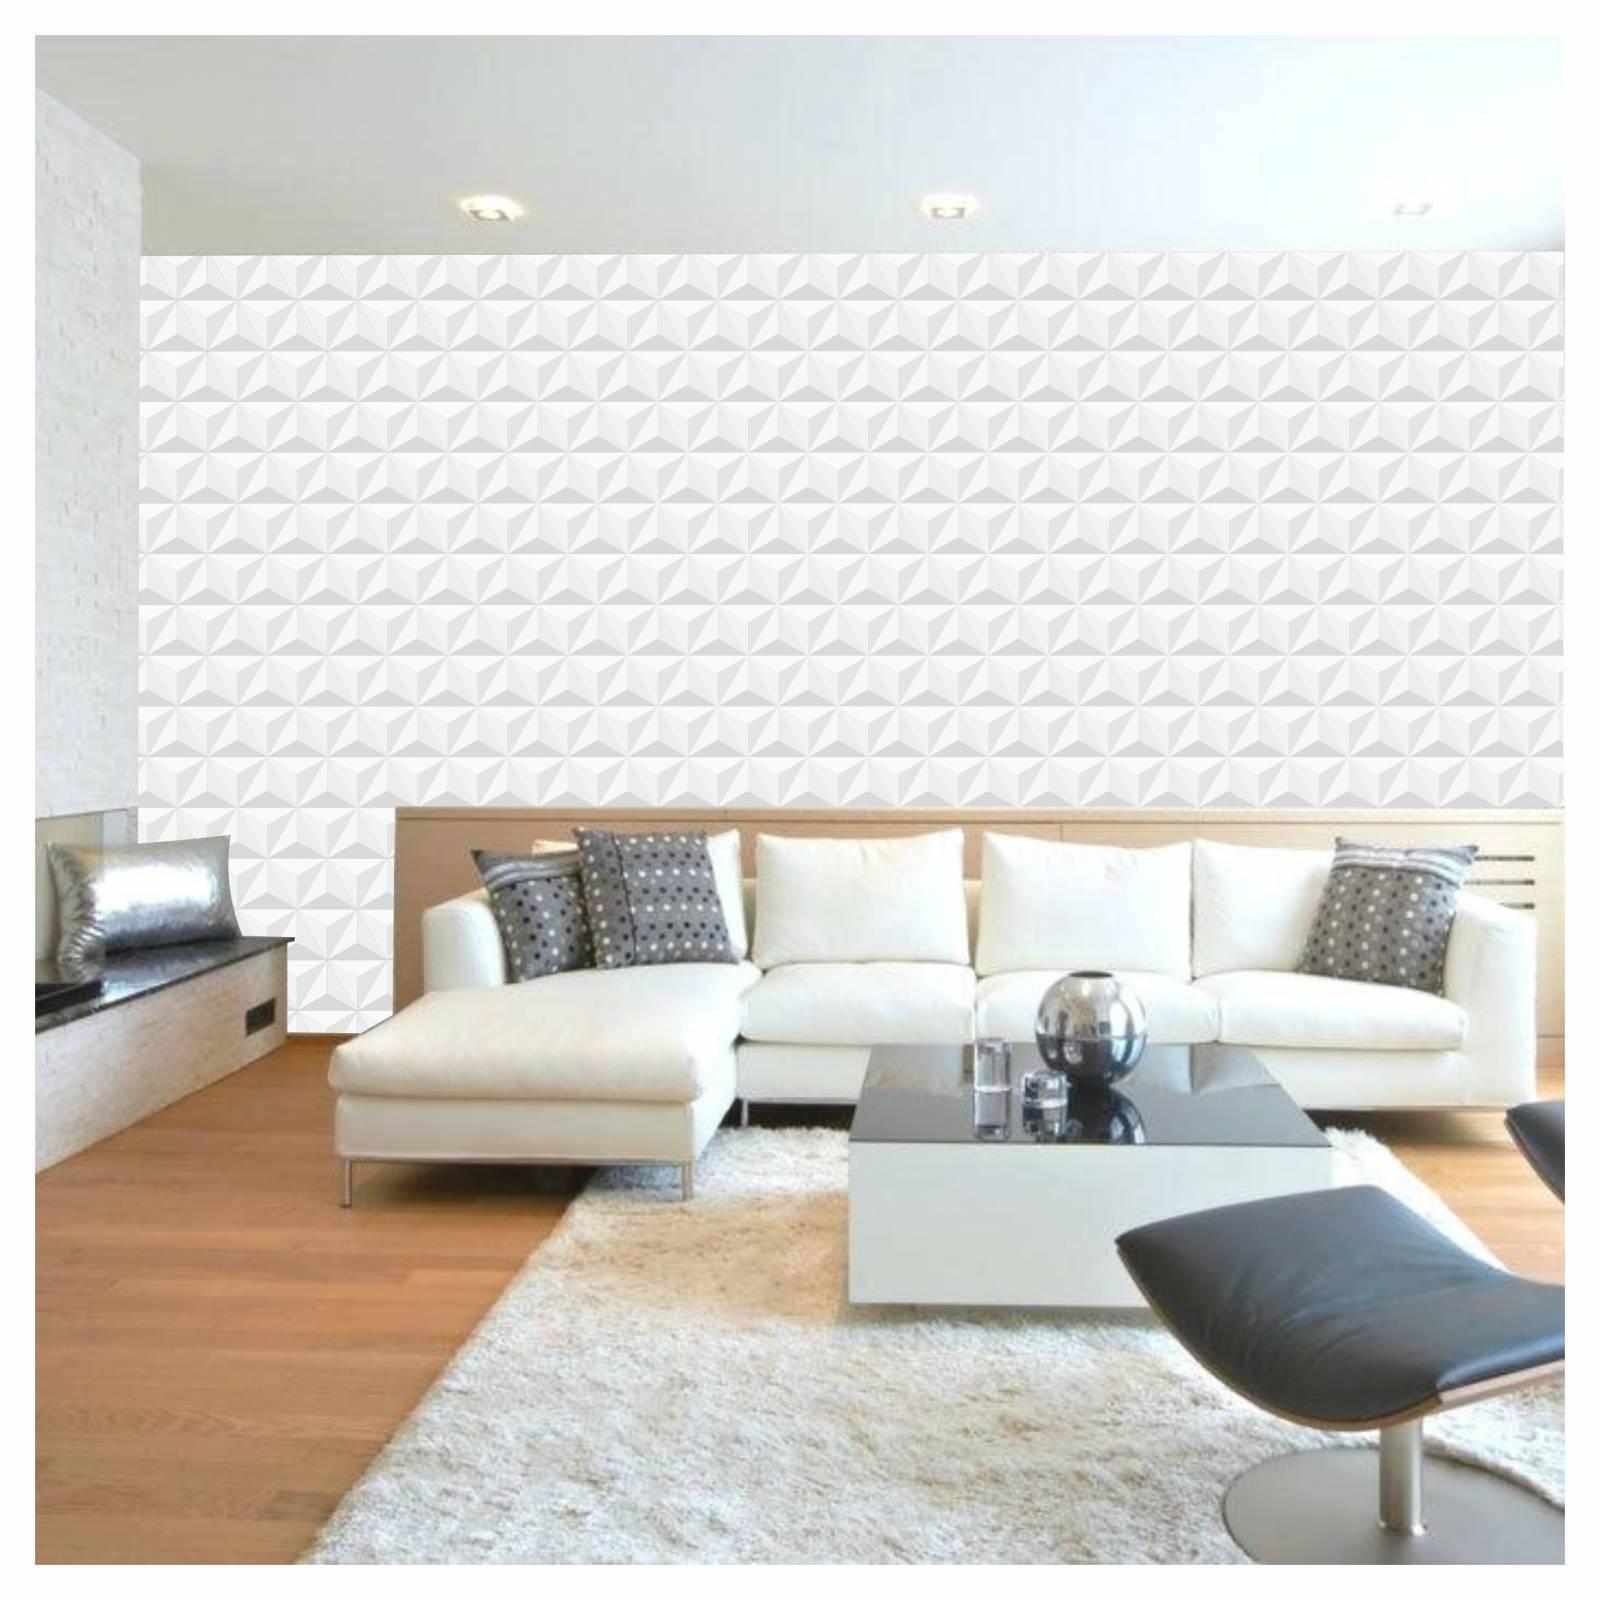 Papel De Parede Adesivo Gesso 3D Branco Vinílico 300x52cm - LCGELETRO